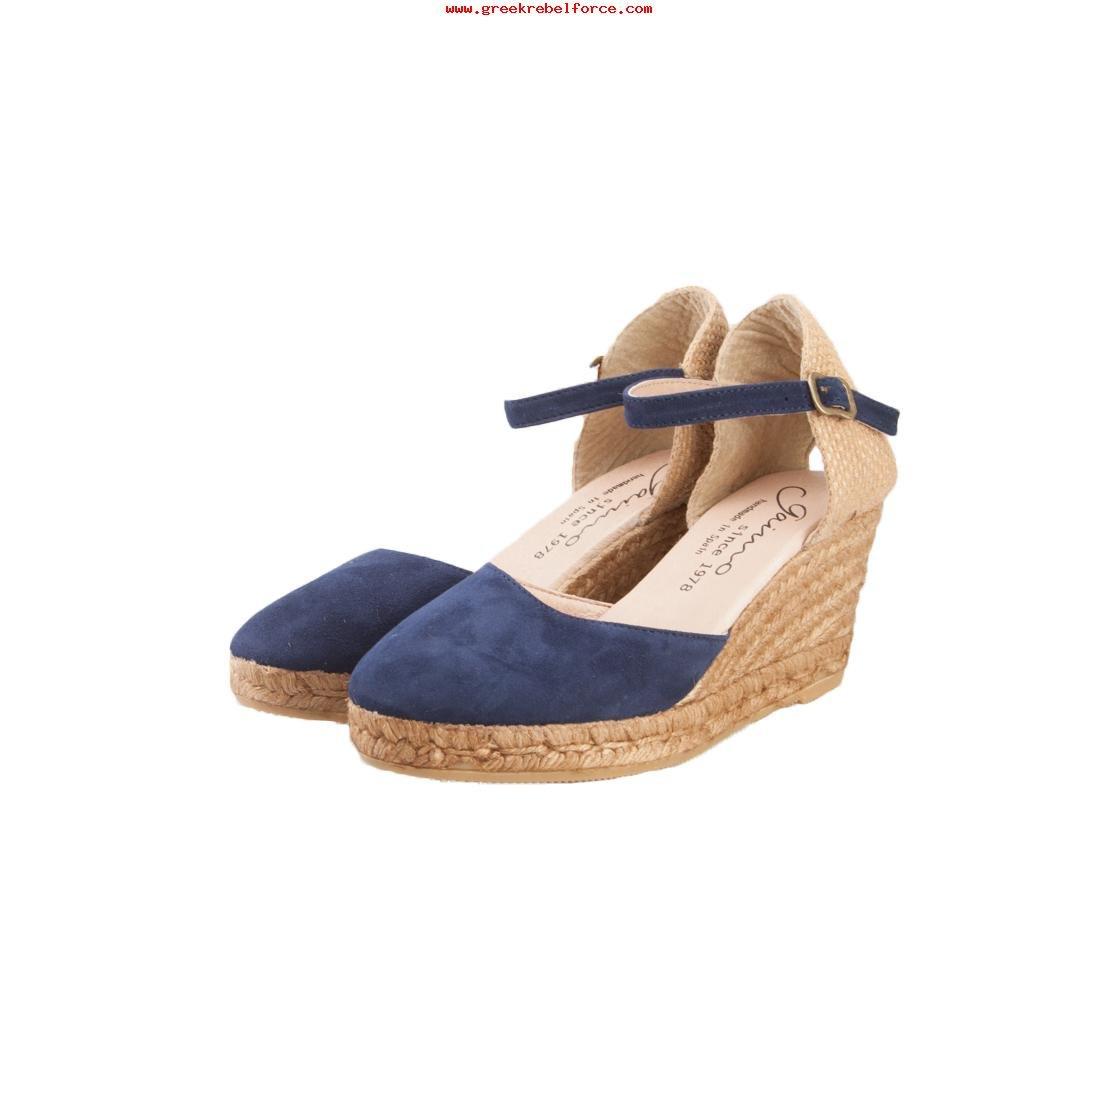 f3876f870ce Gaimo Women's OBI.2595P Espadrilles Blue Size: 6.5: Amazon.co.uk ...